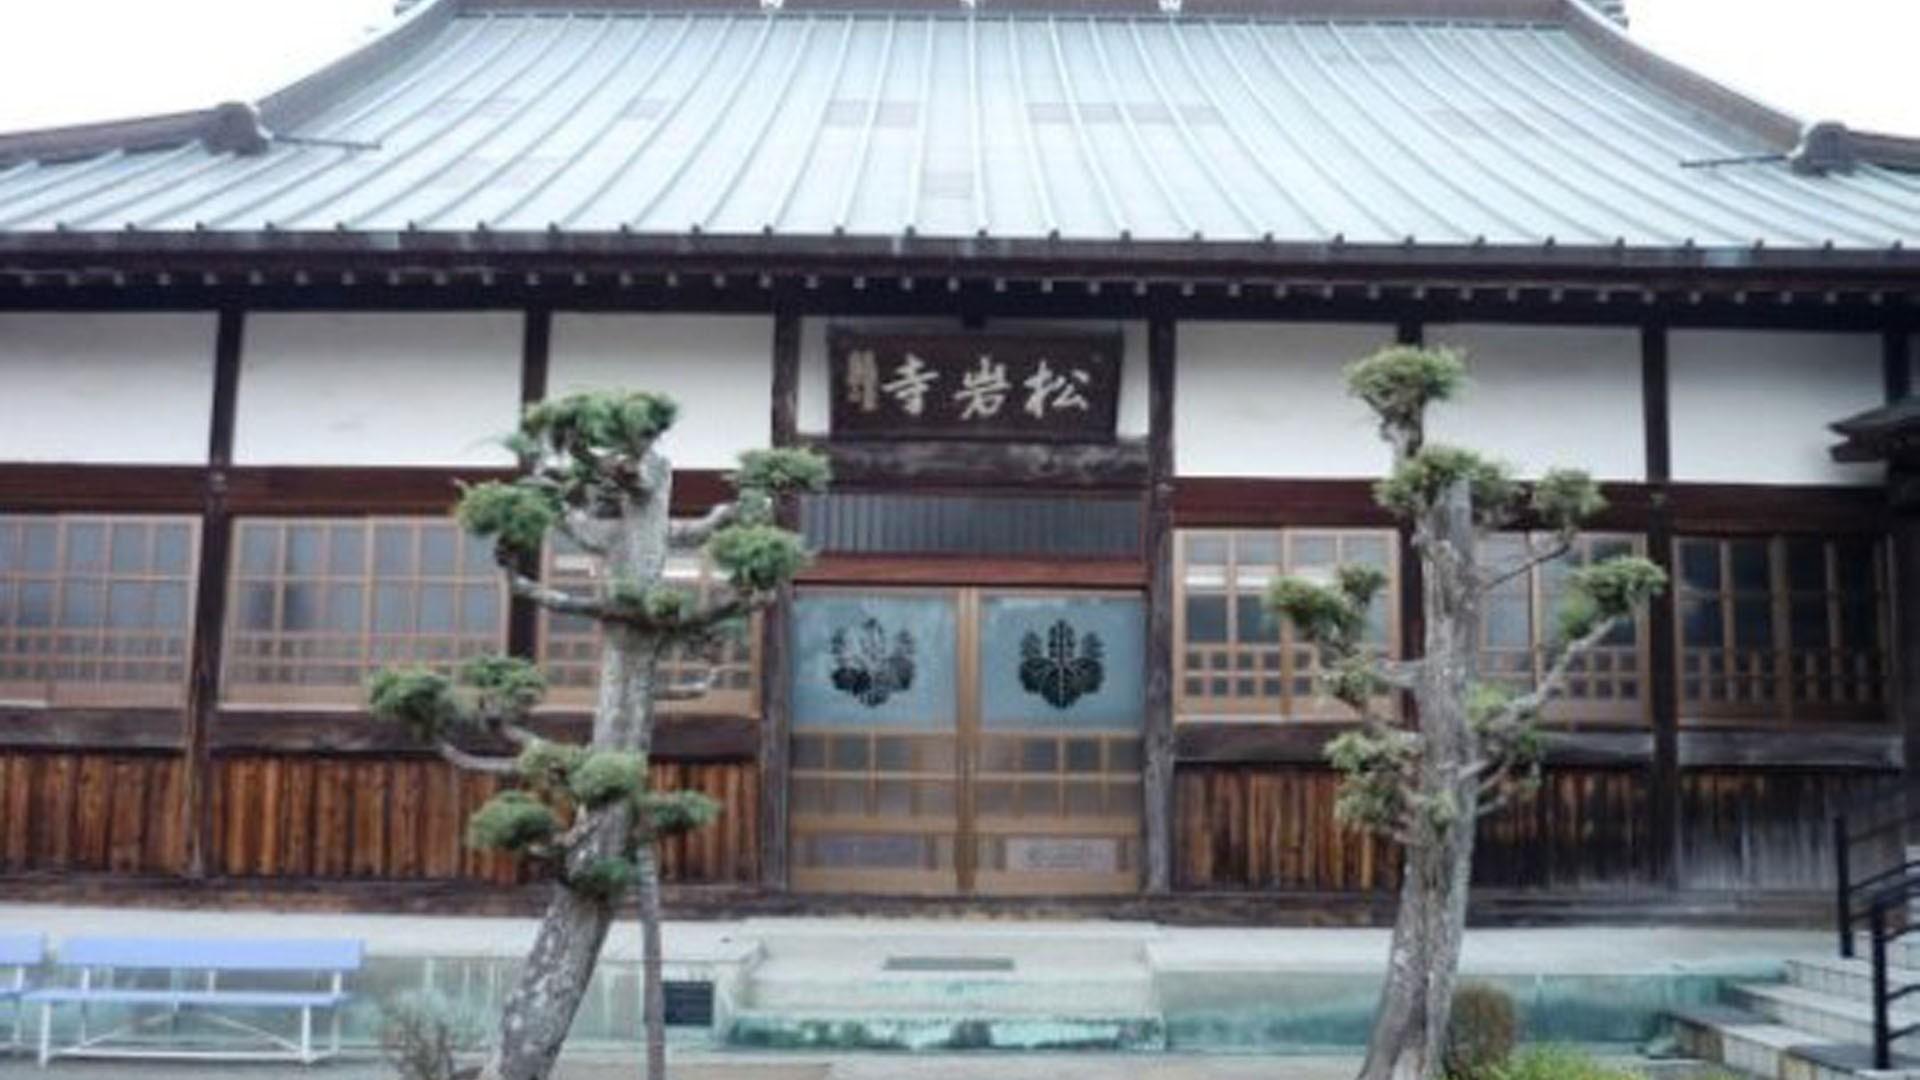 Shogan-ji Temple